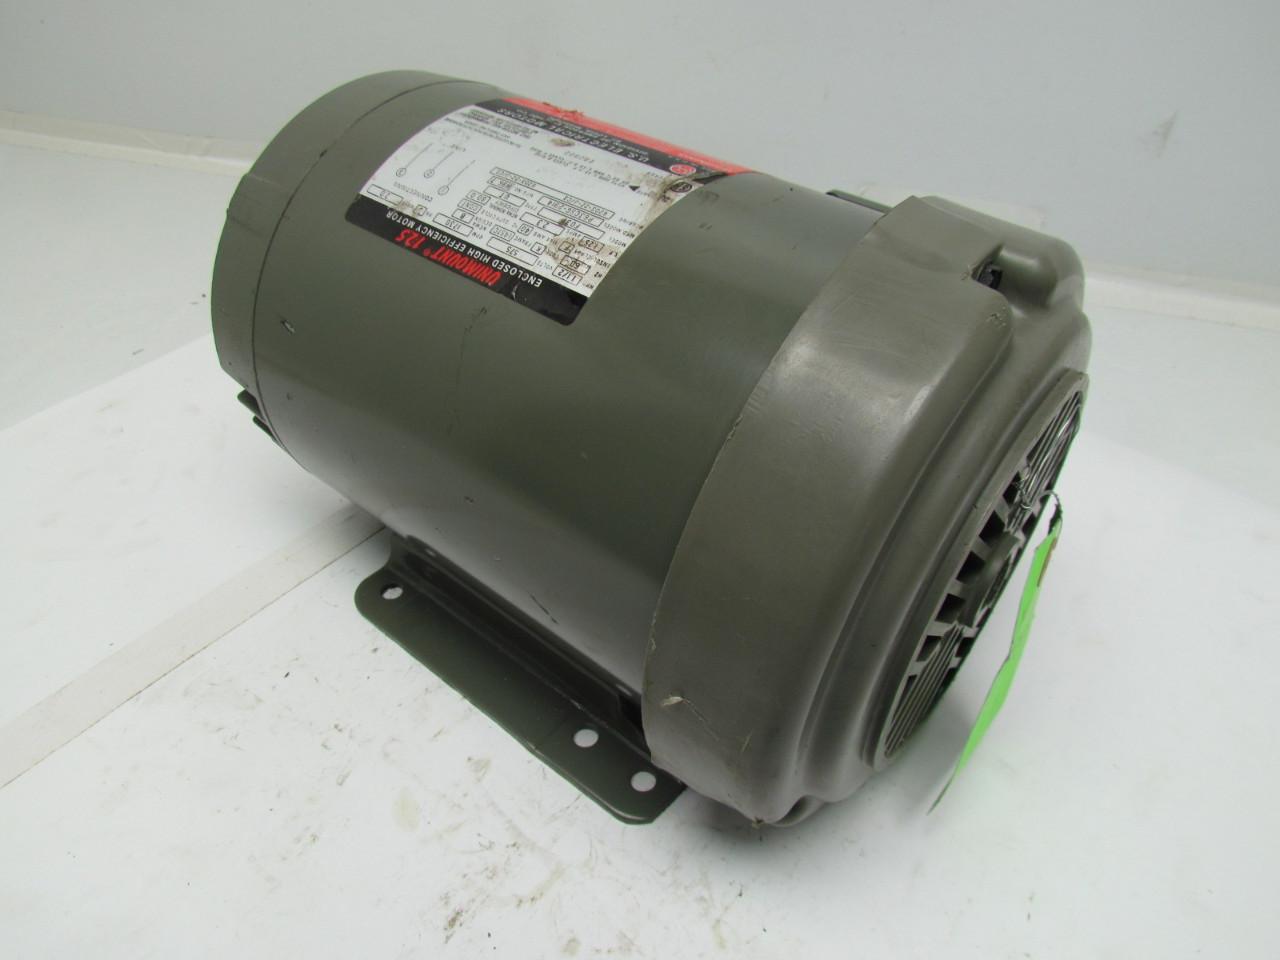 Us motors p63csg 2914 unimount 125 3 phase ac motor 1 5hp for Three phase ac motors